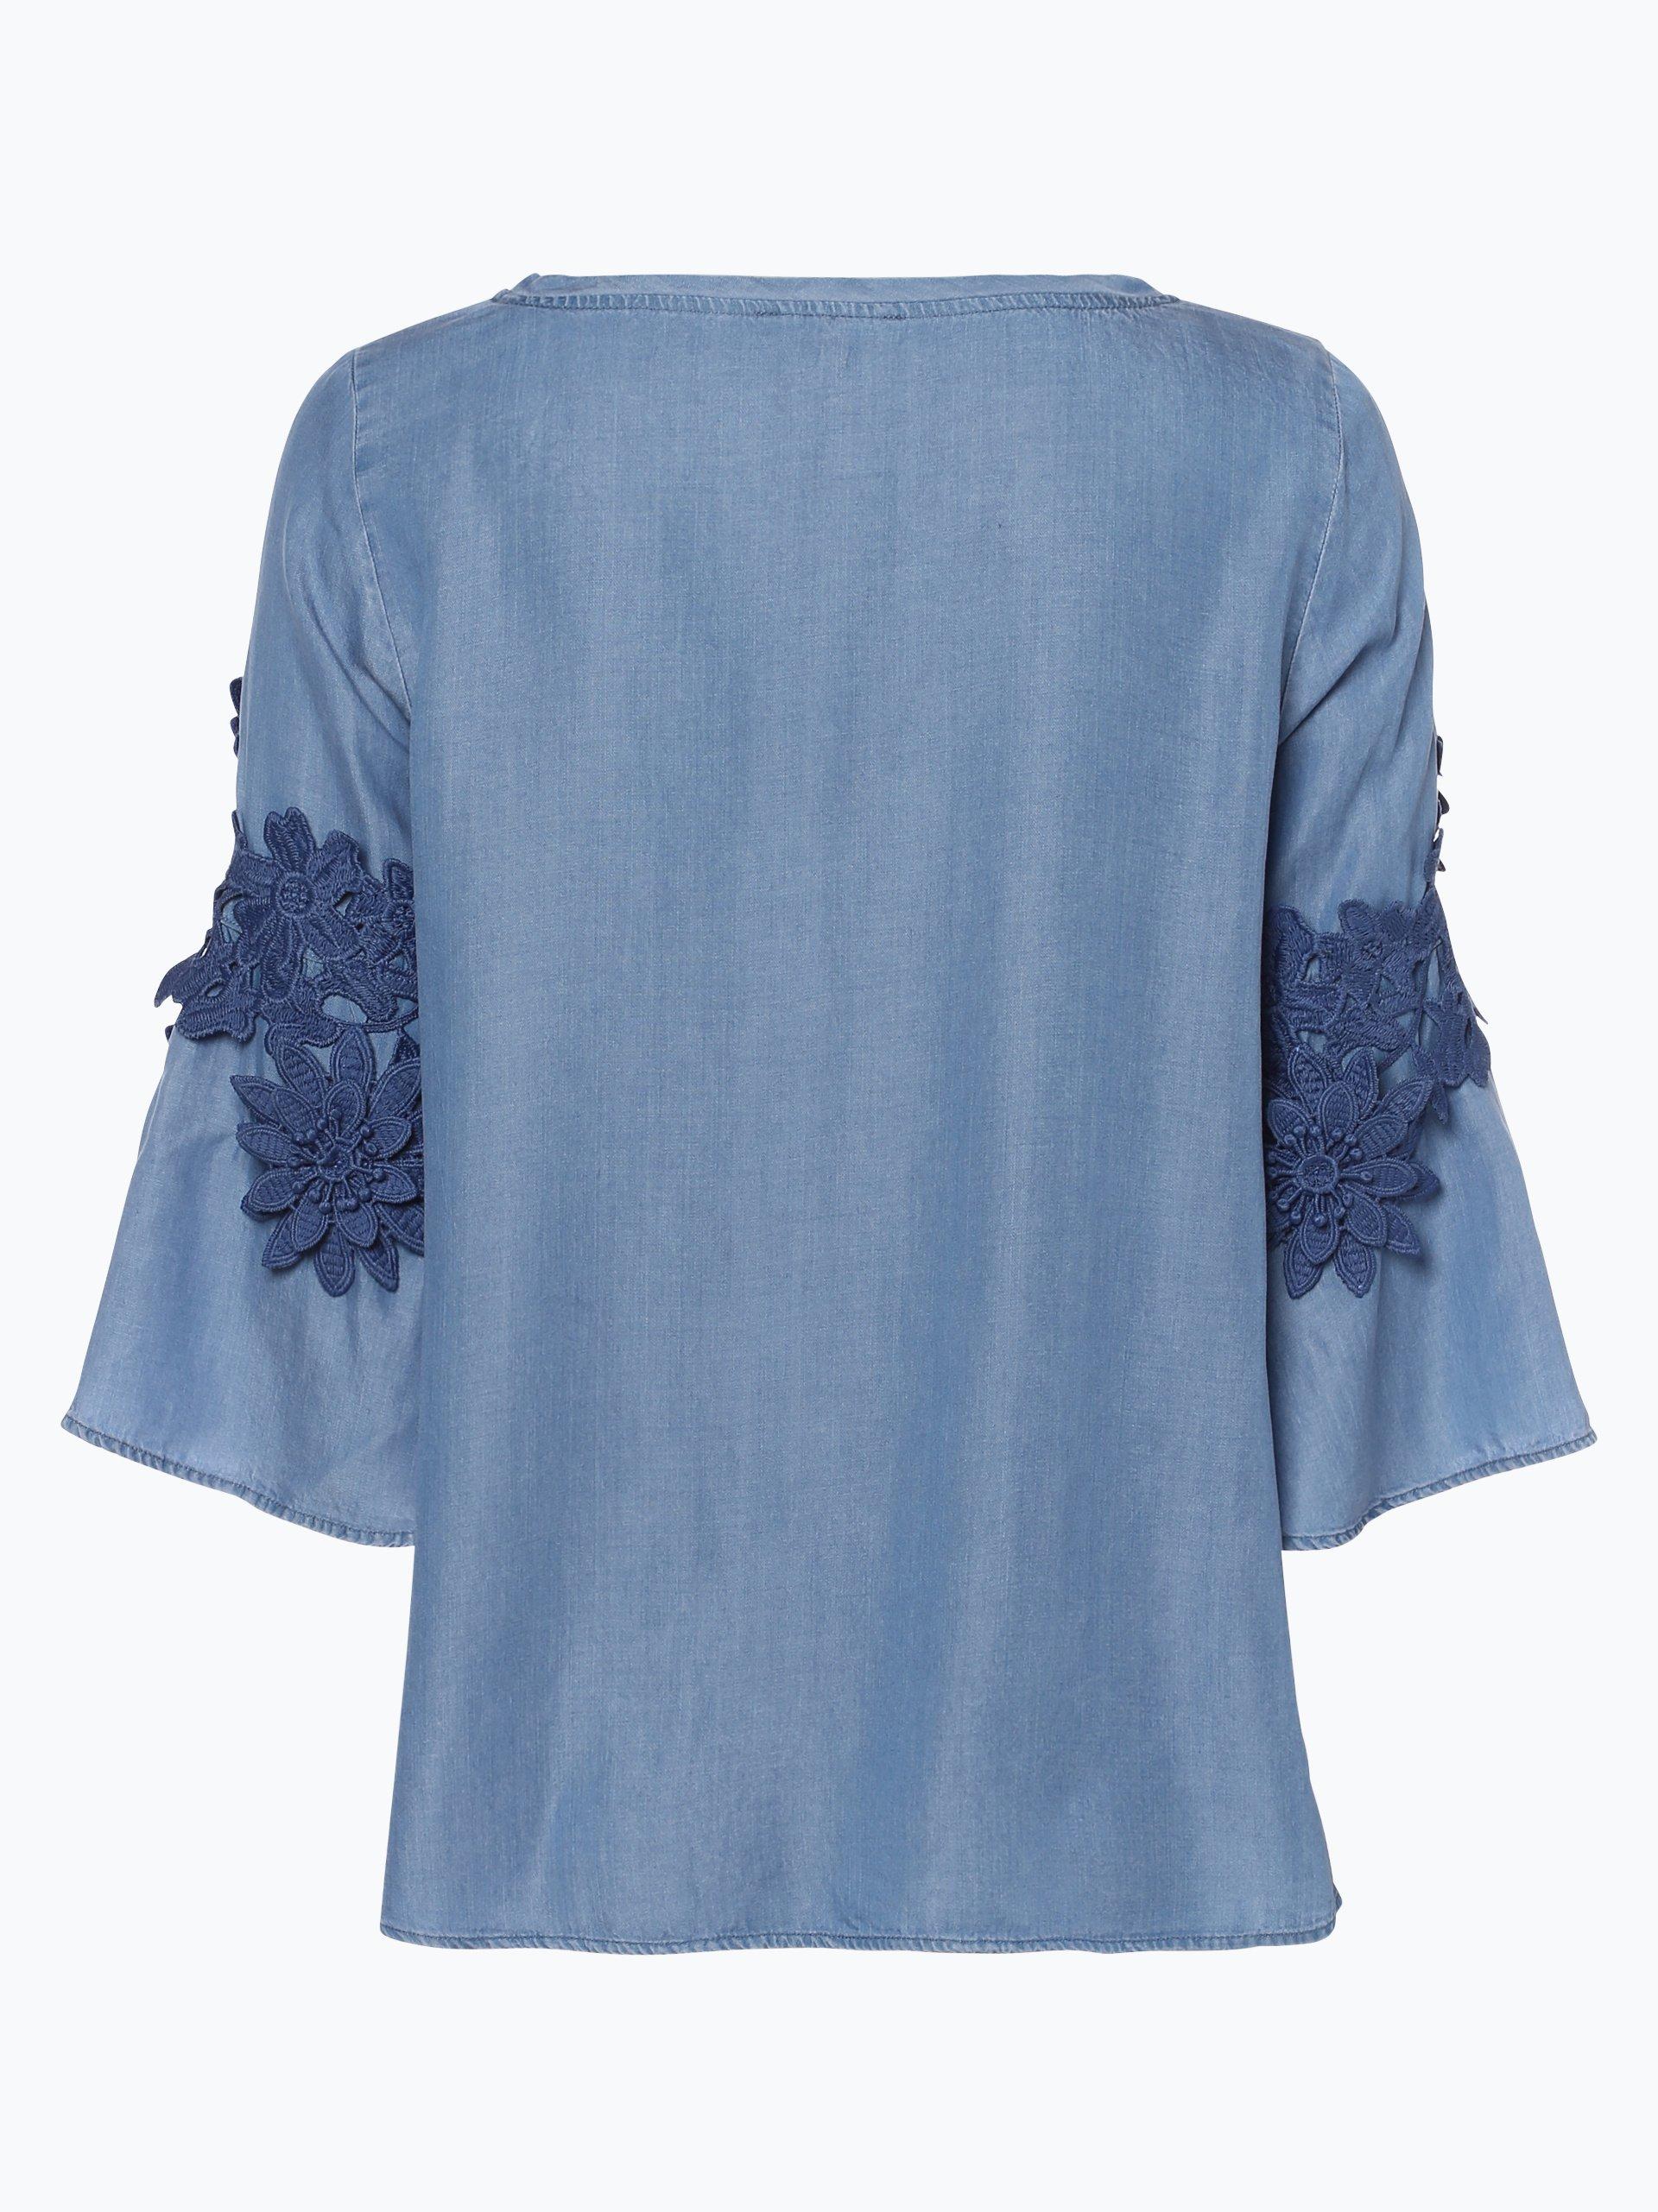 more more damen bluse blau uni online kaufen peek und cloppenburg de. Black Bedroom Furniture Sets. Home Design Ideas